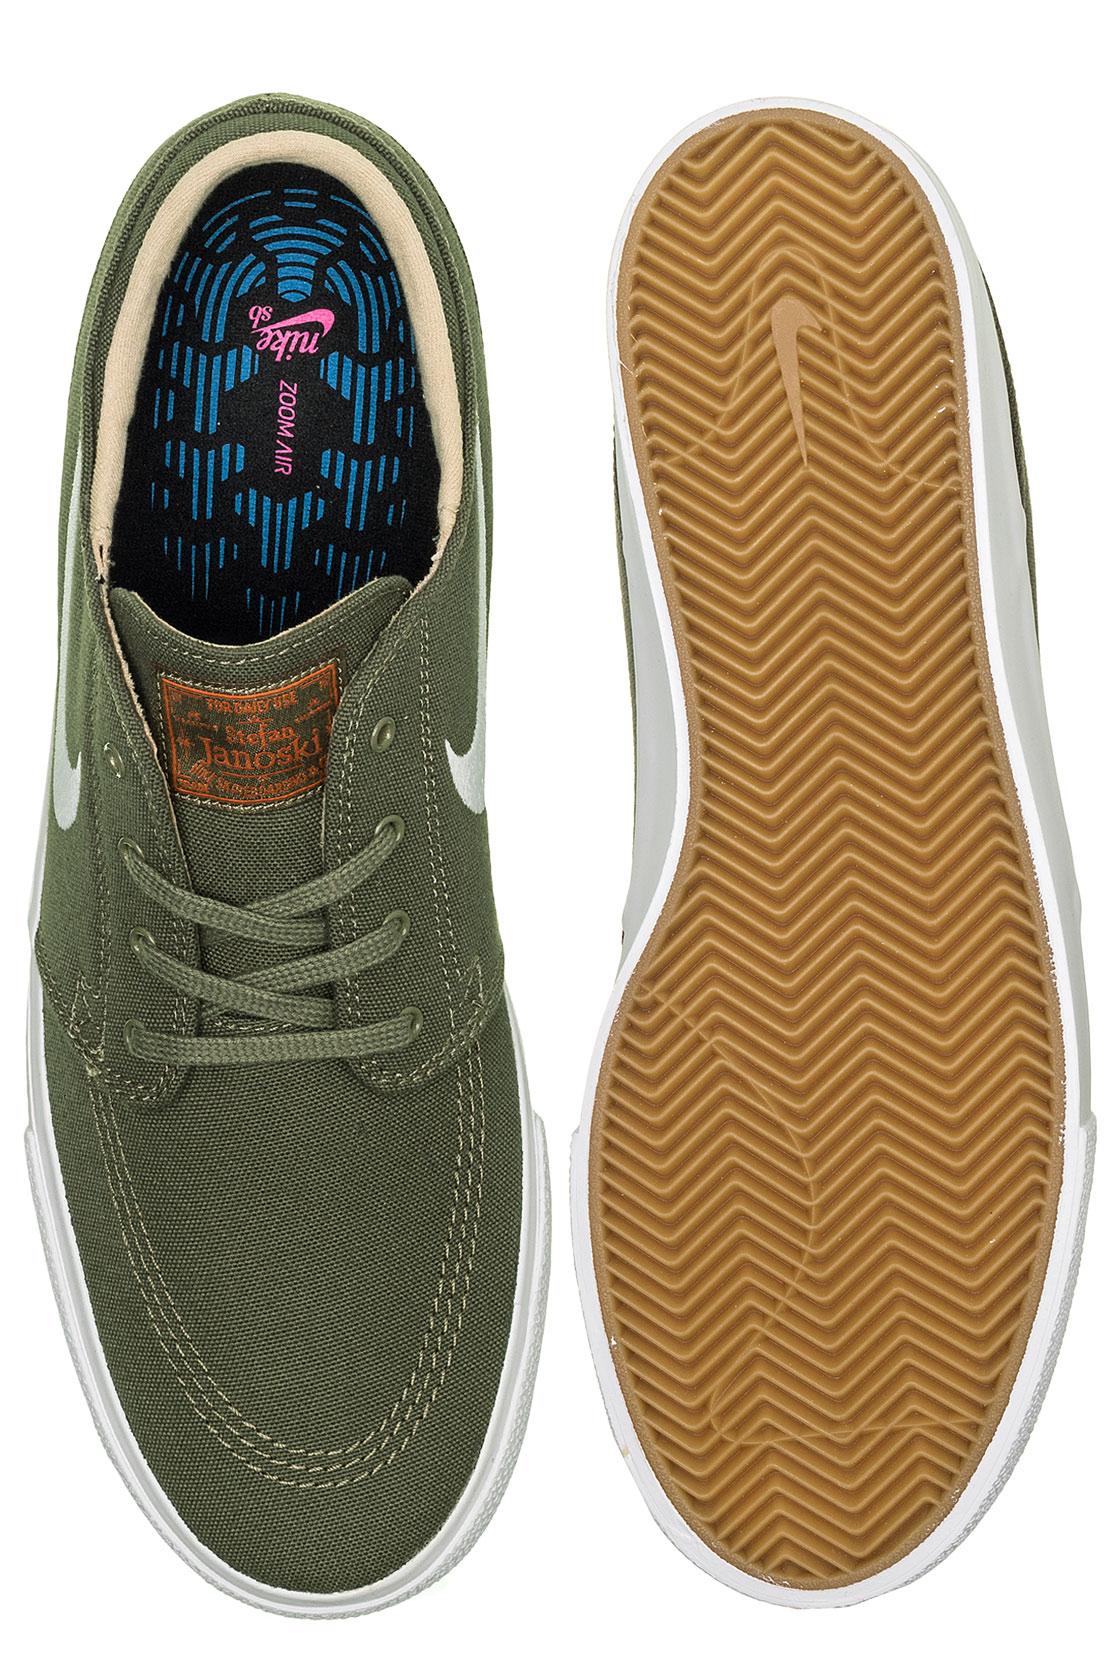 Zoom Janoski Chaussuremedium Sb Gum Rm Nike Canvas Olive wyNn0Ovm8